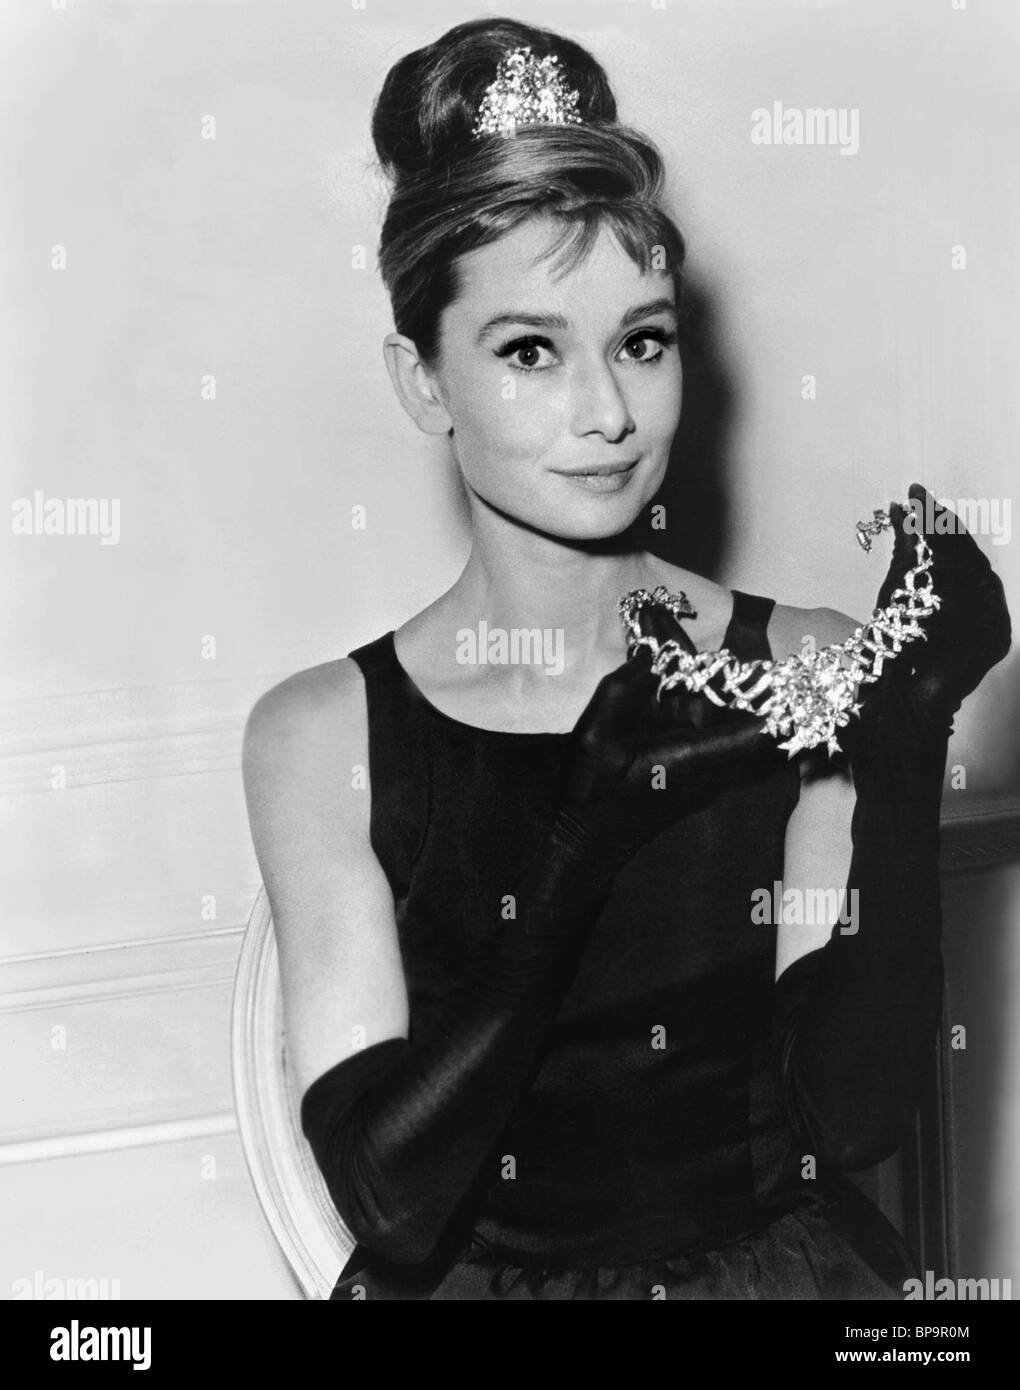 2af58723678 AUDREY HEPBURN BREAKFAST AT TIFFANY S (1961 Stock Photo  30948420 ...